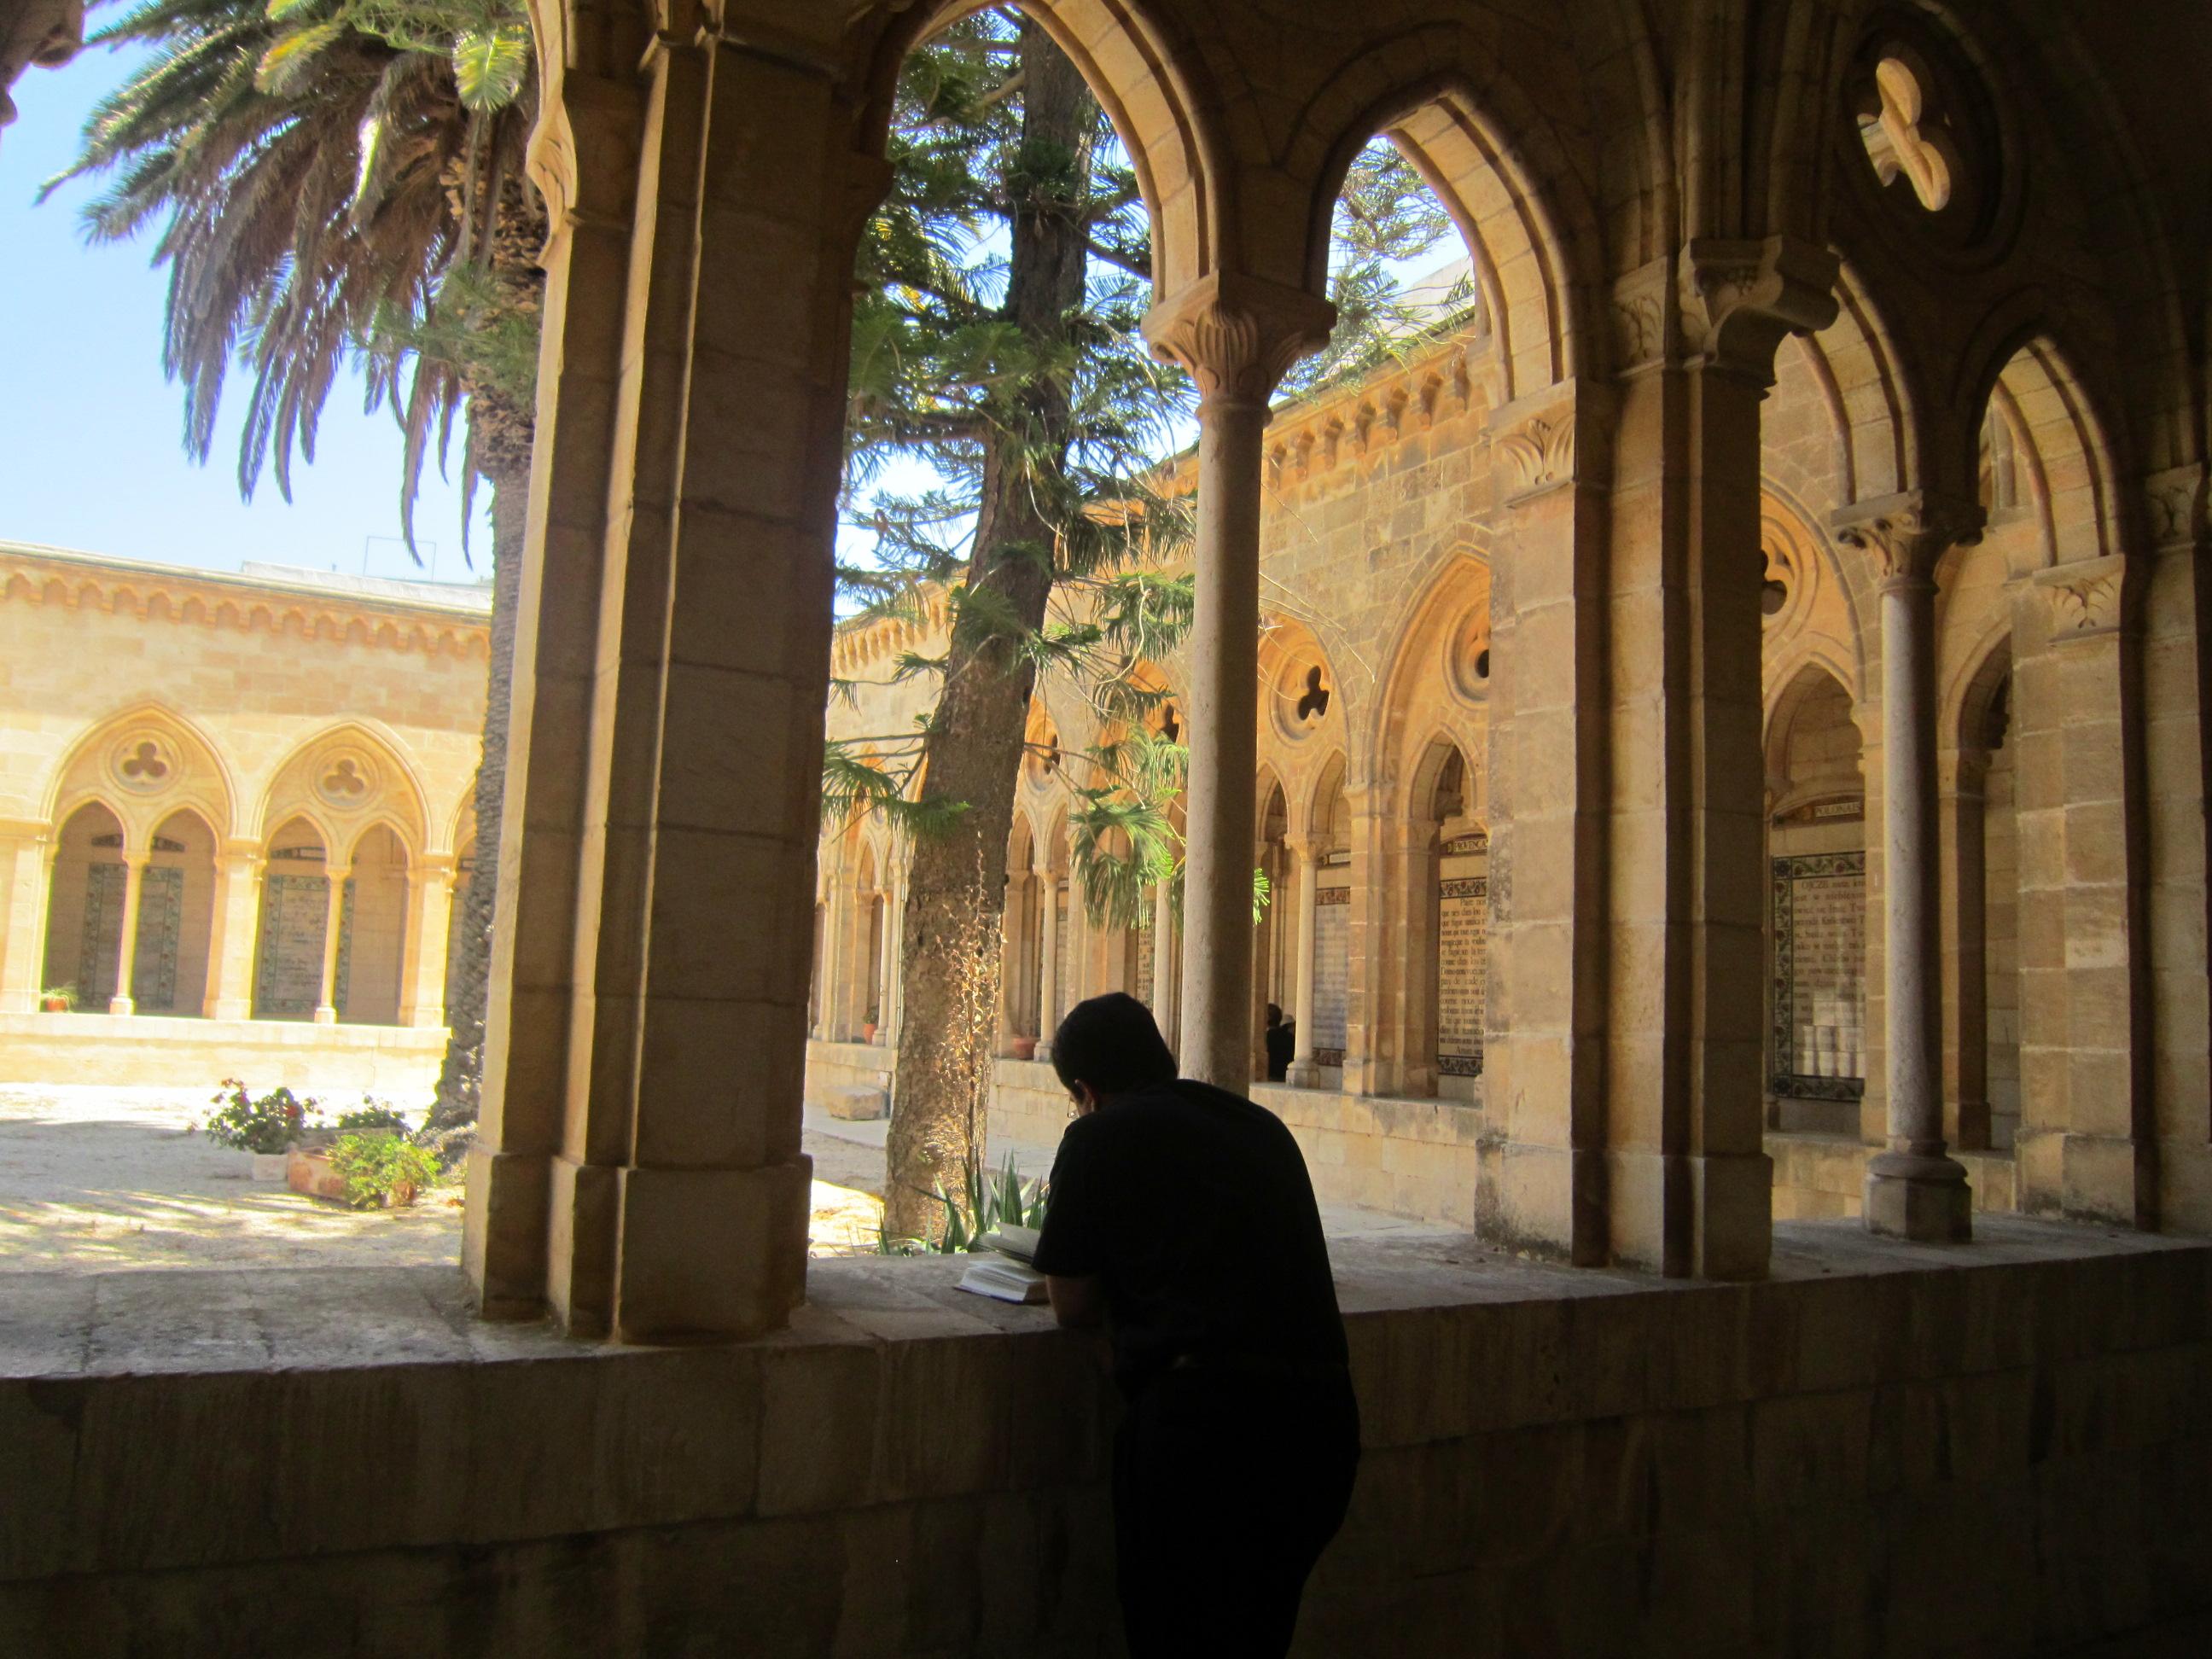 Bishop Oscar Cantu meditates at Pater Noster in Jerusalem while on pilgrimage with us.